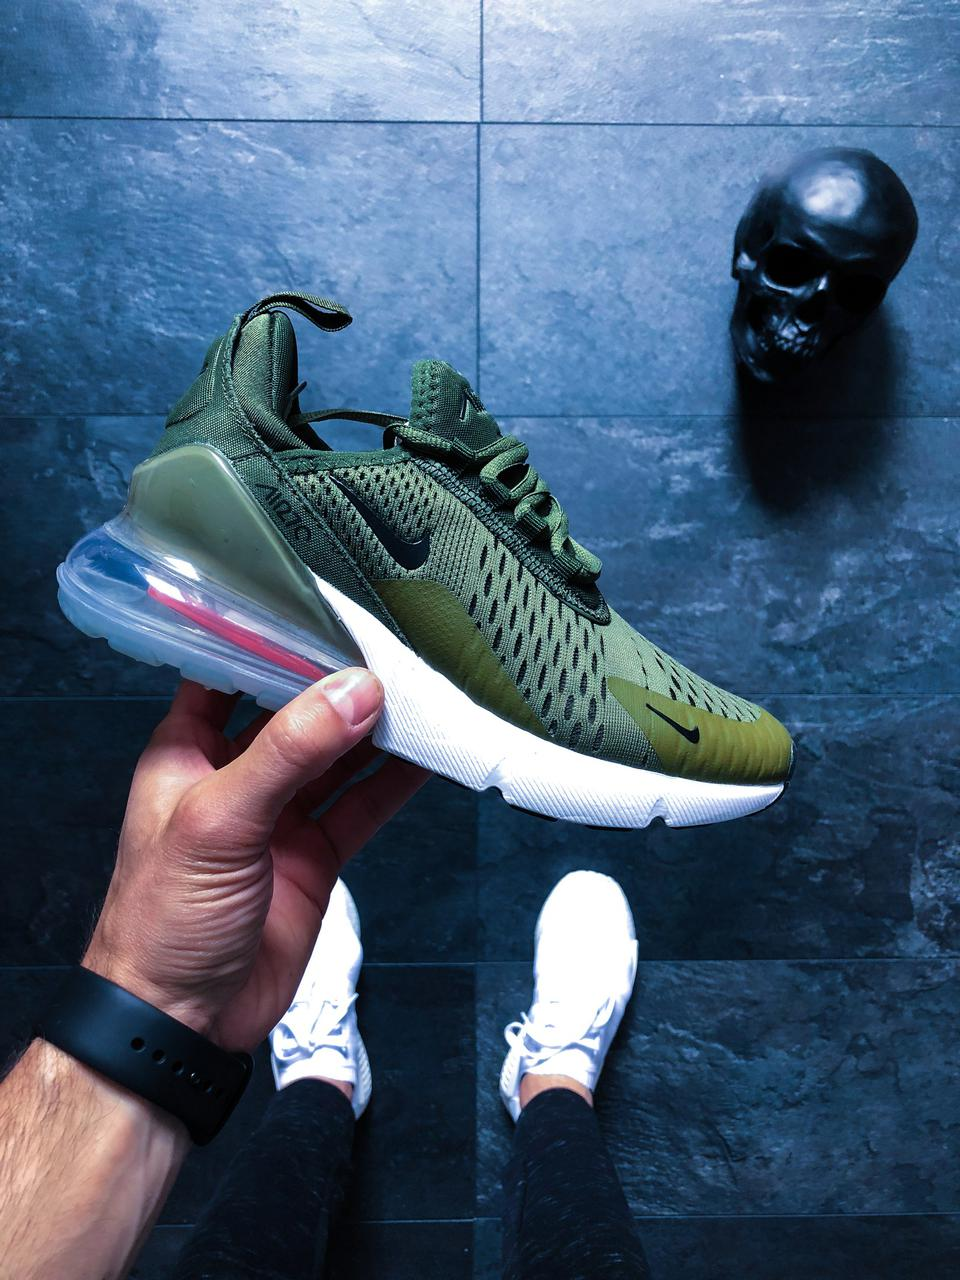 dd206582 Кроссовки в стиле Nike Air Max 270 (Medium Olive / Black): продажа ...